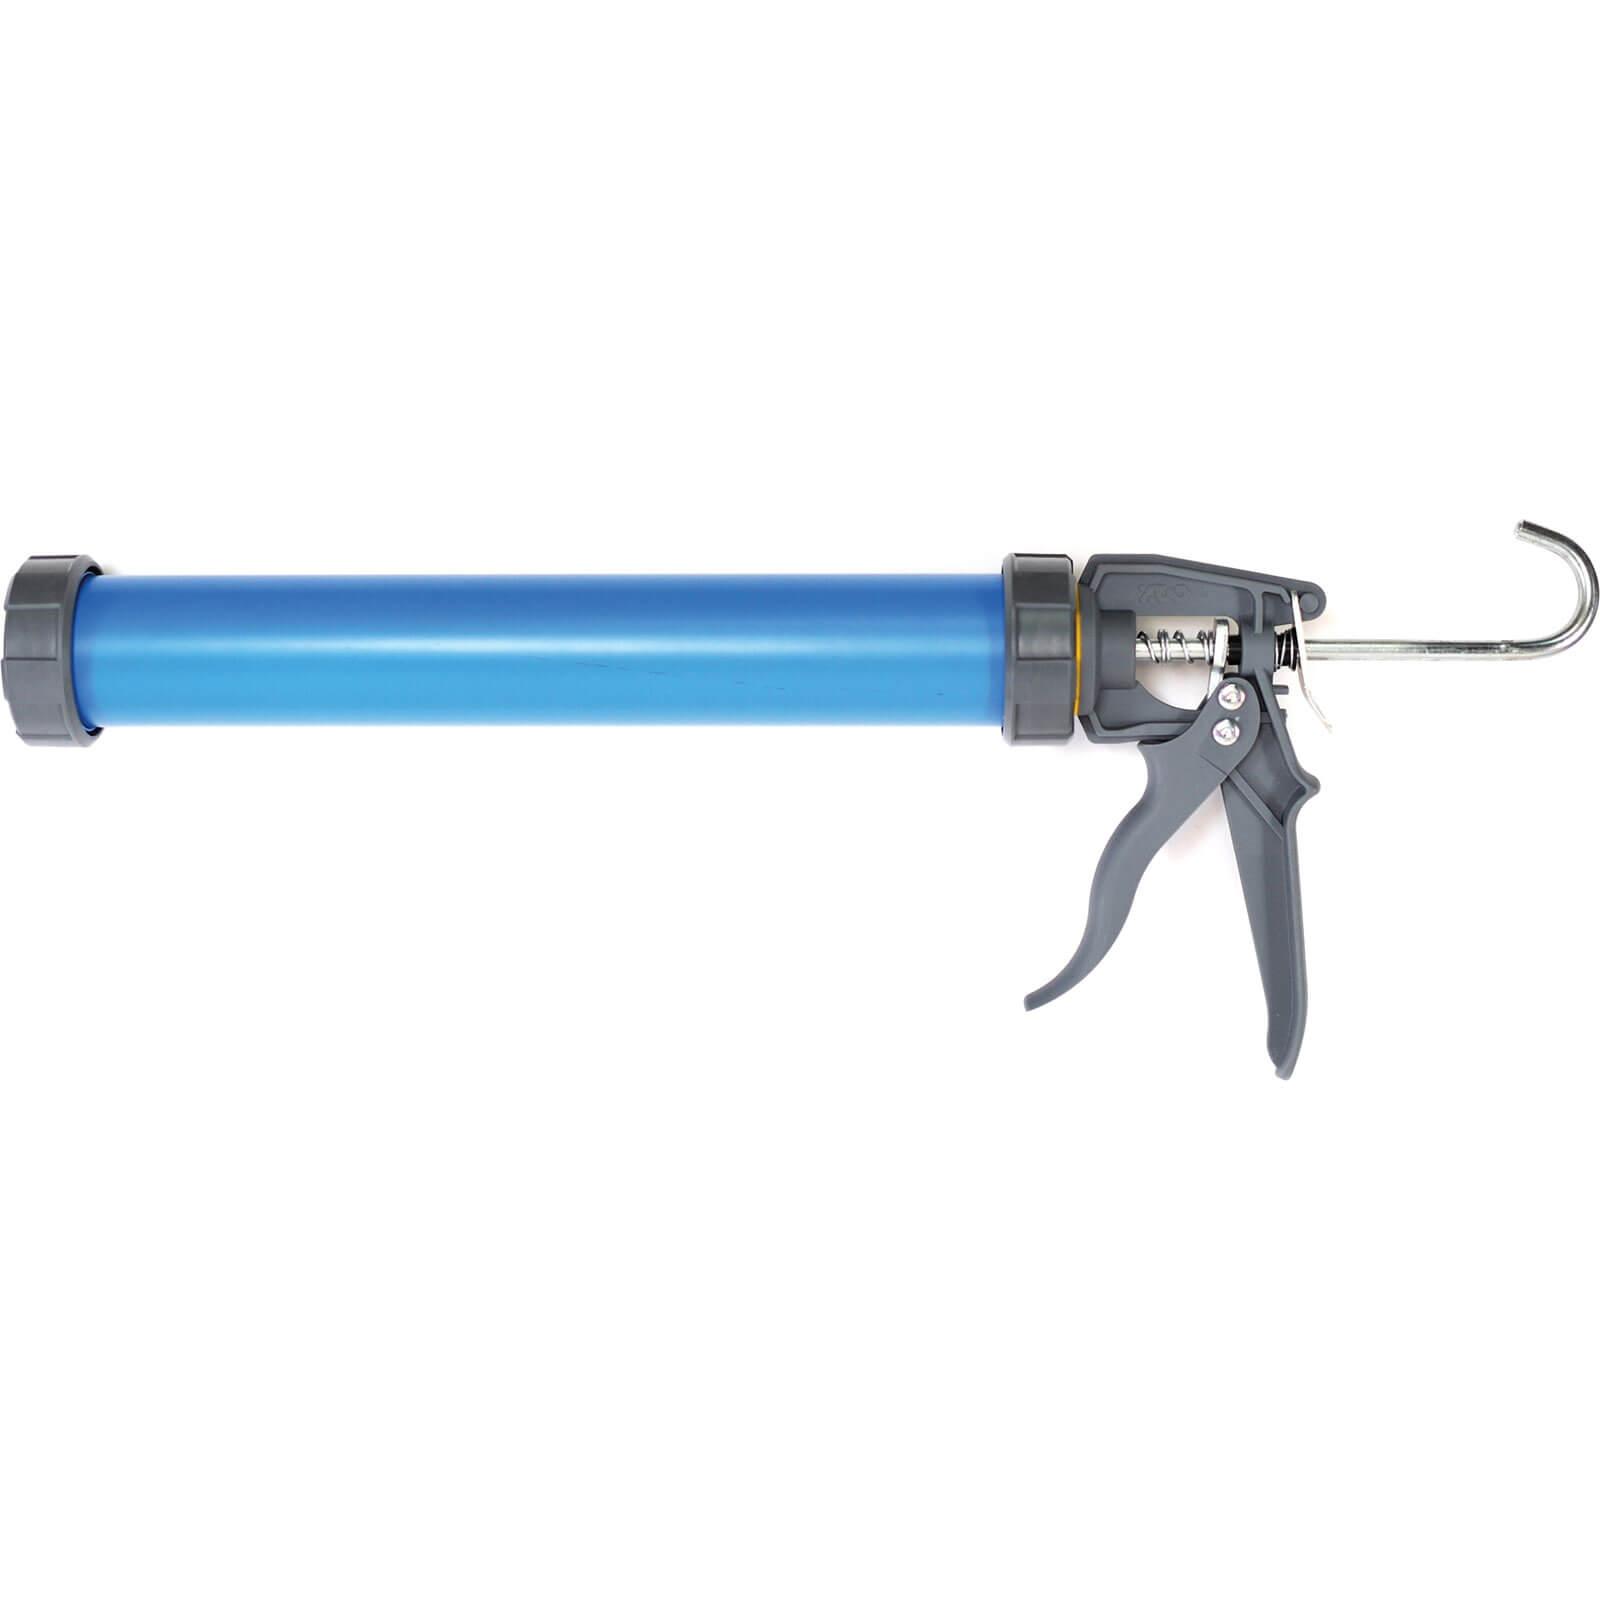 Cox Midiflow Caulking, Mastic & Sealant Gun for Cartridges up to 400ml & 600ml Foil Packs